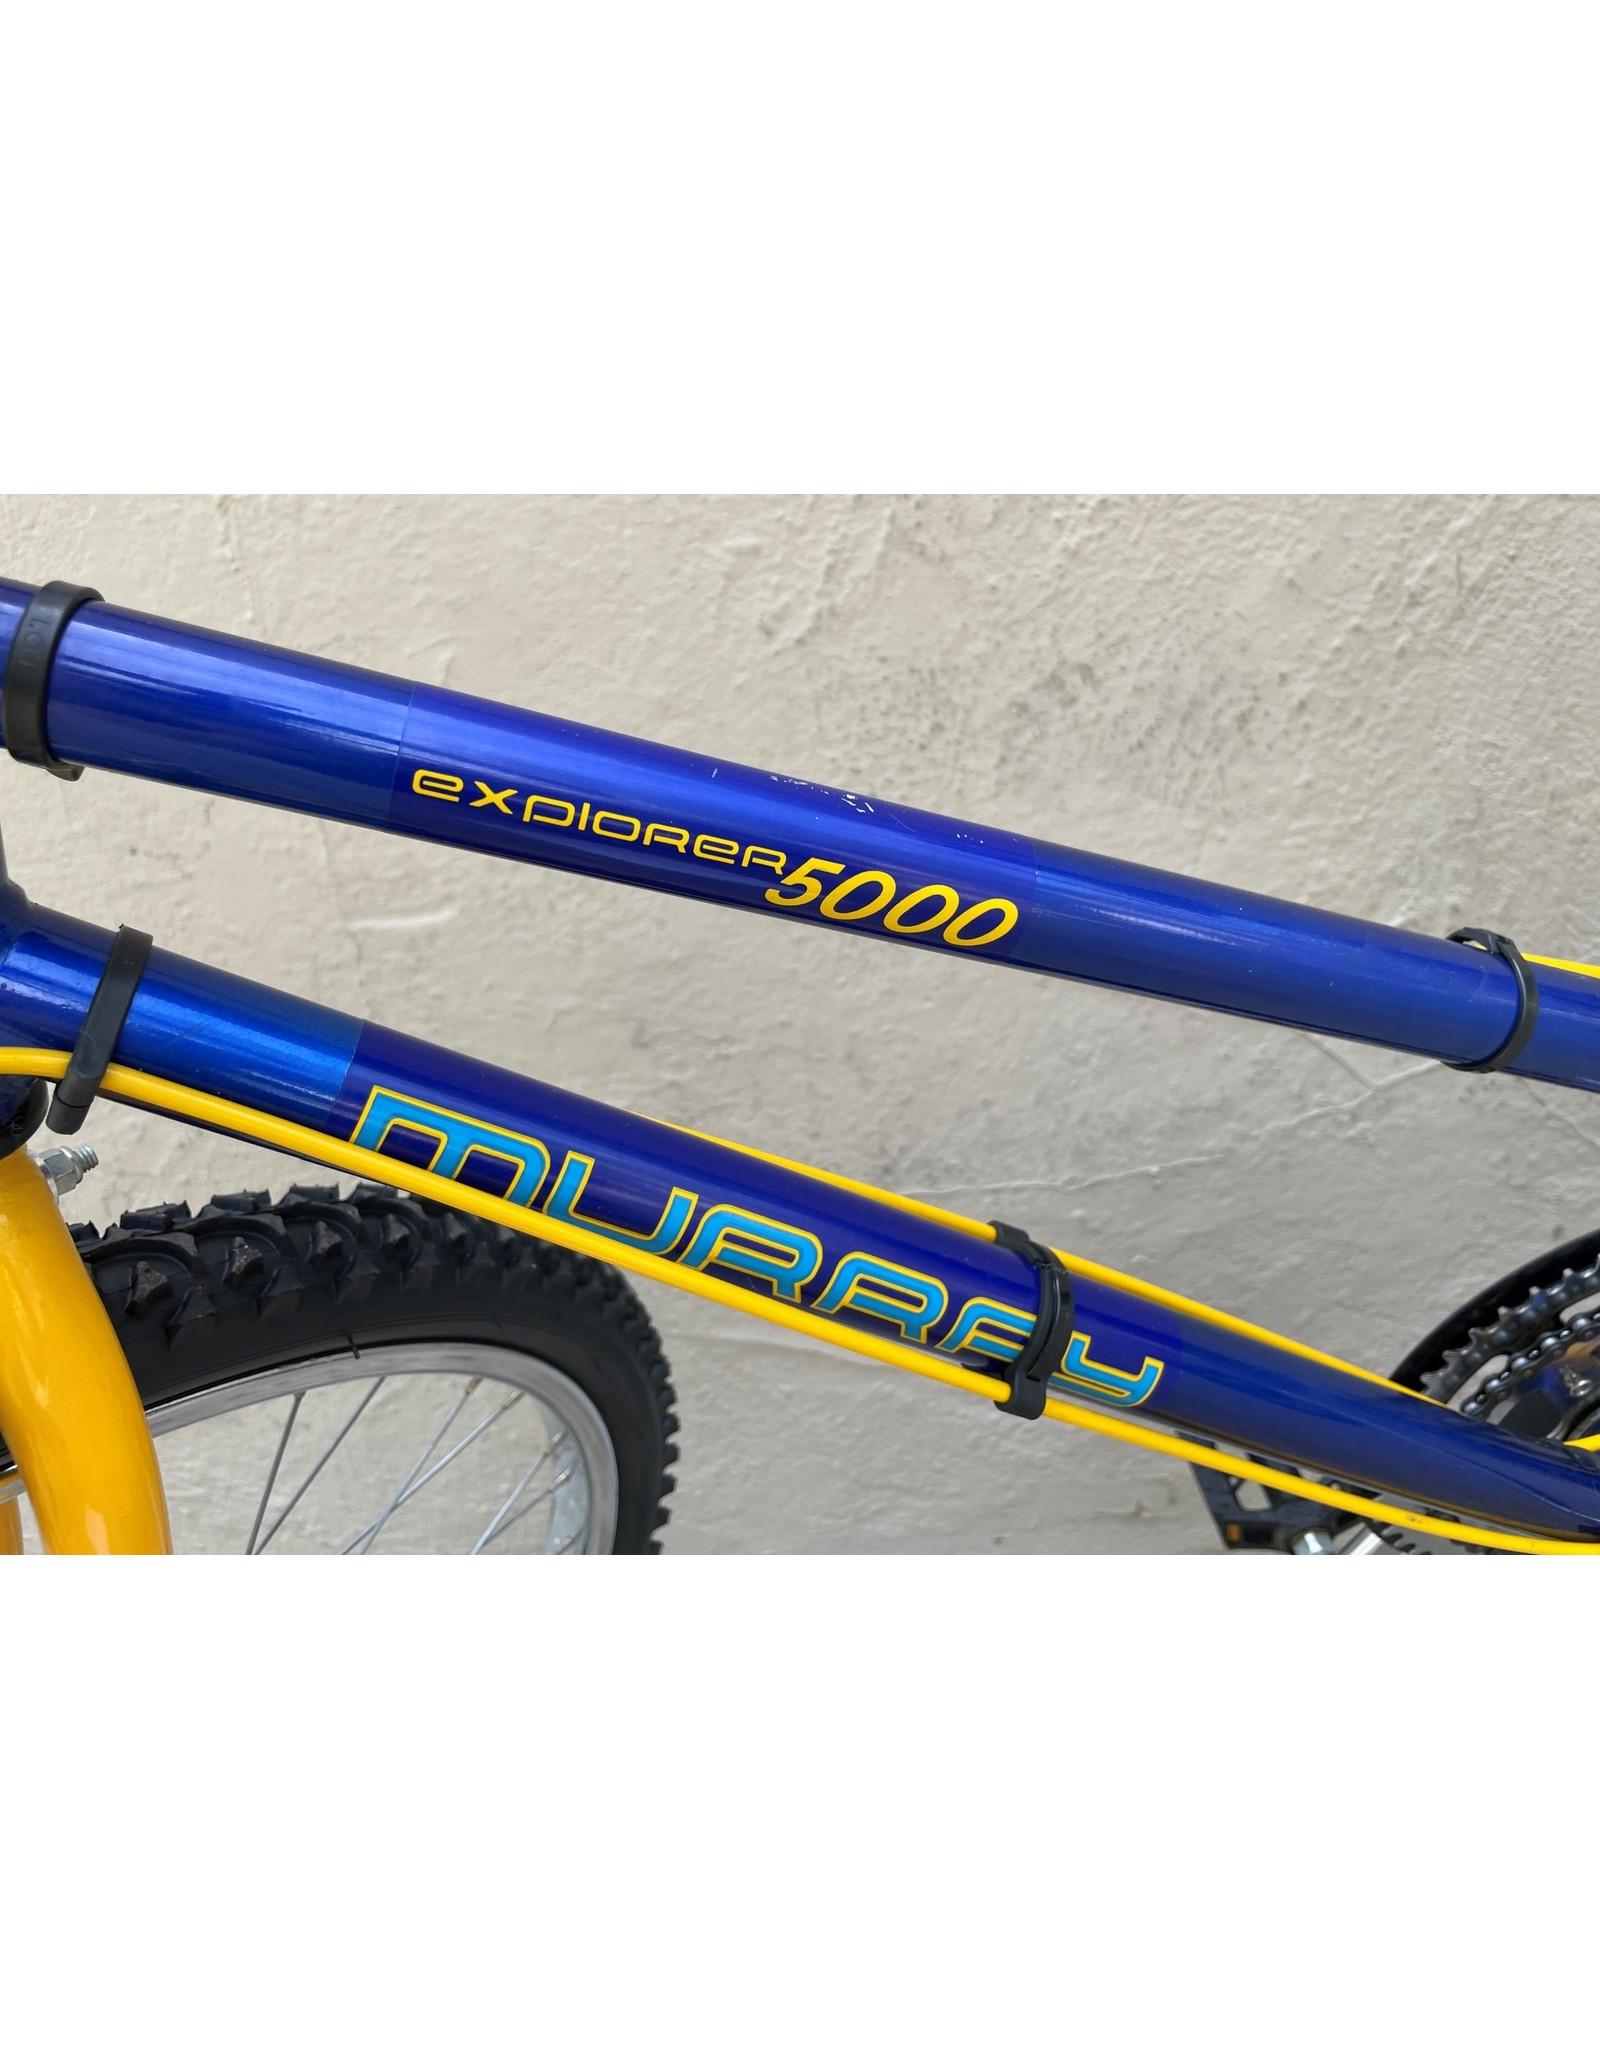 Murray Murray Explorer 5000 MC Series, Vintage, 1988, Blue & Yellow, 19 Inches